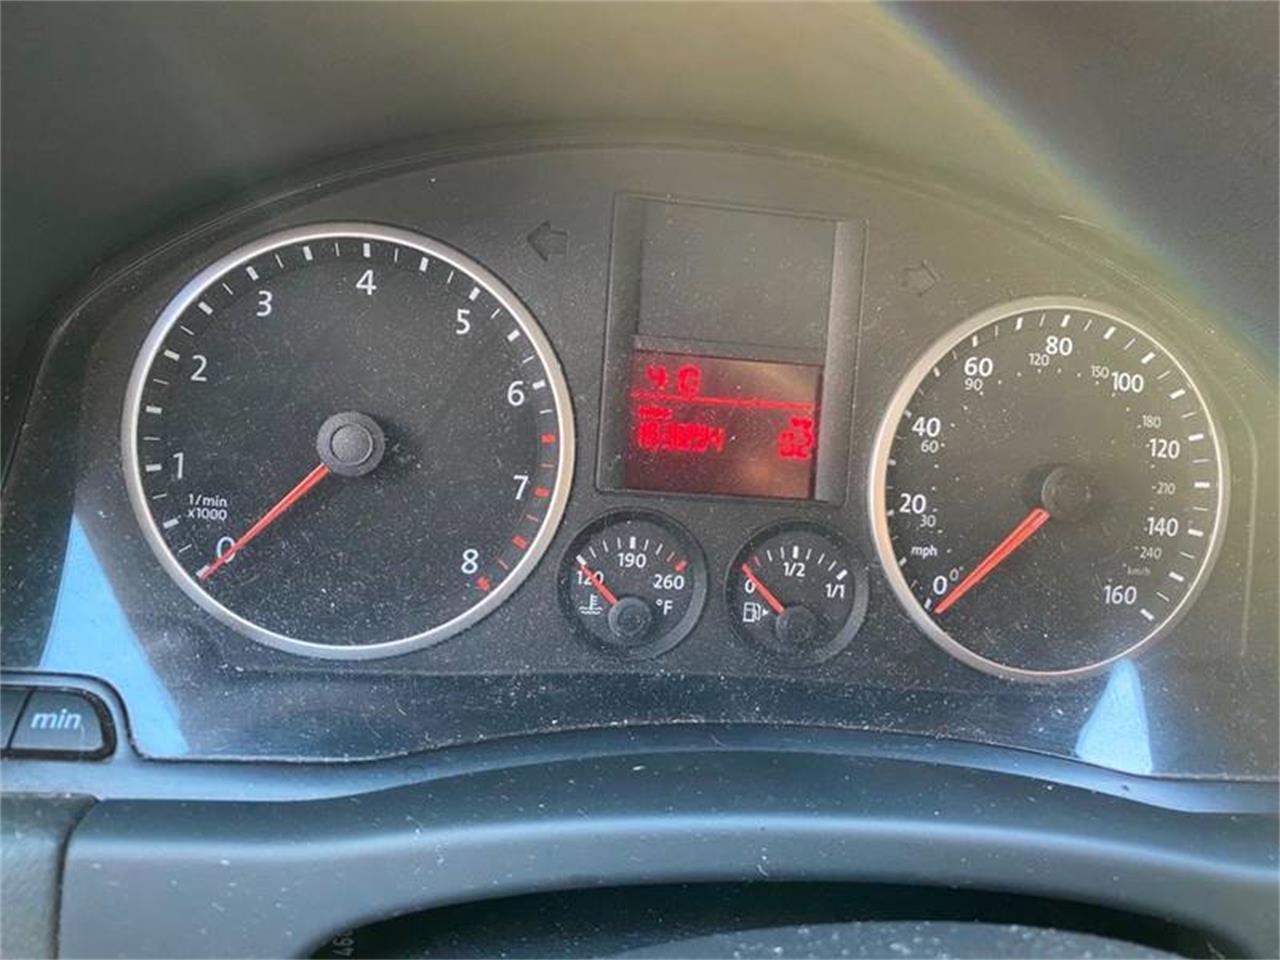 2009 Volkswagen Tiguan (CC-1312812) for sale in Fort Lauderdale, Florida